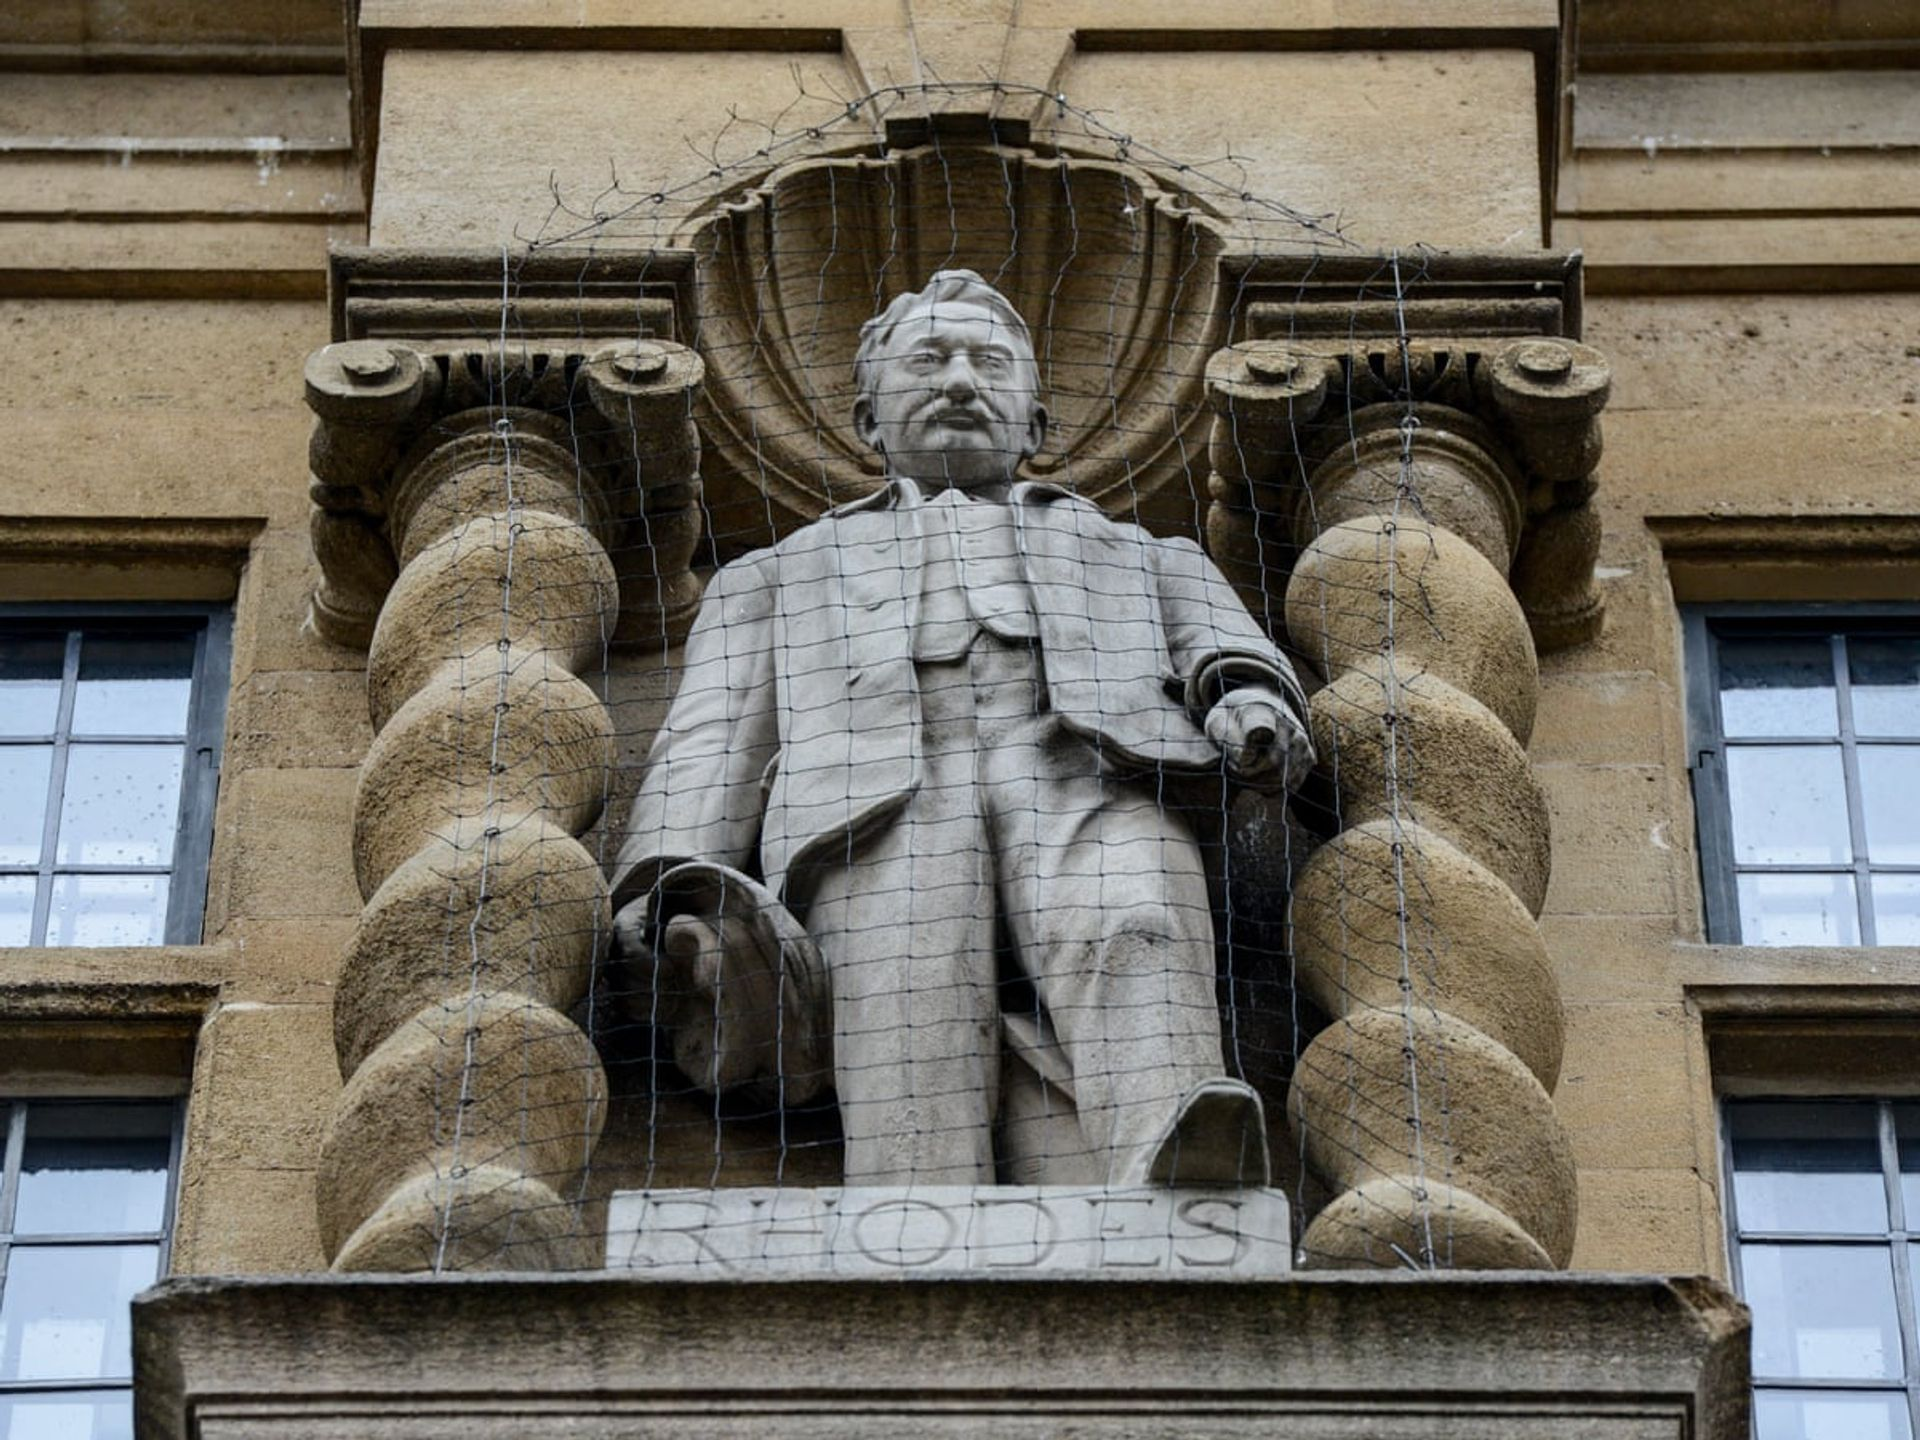 The Cecil Rhodes statue at Oriel College in Oxford